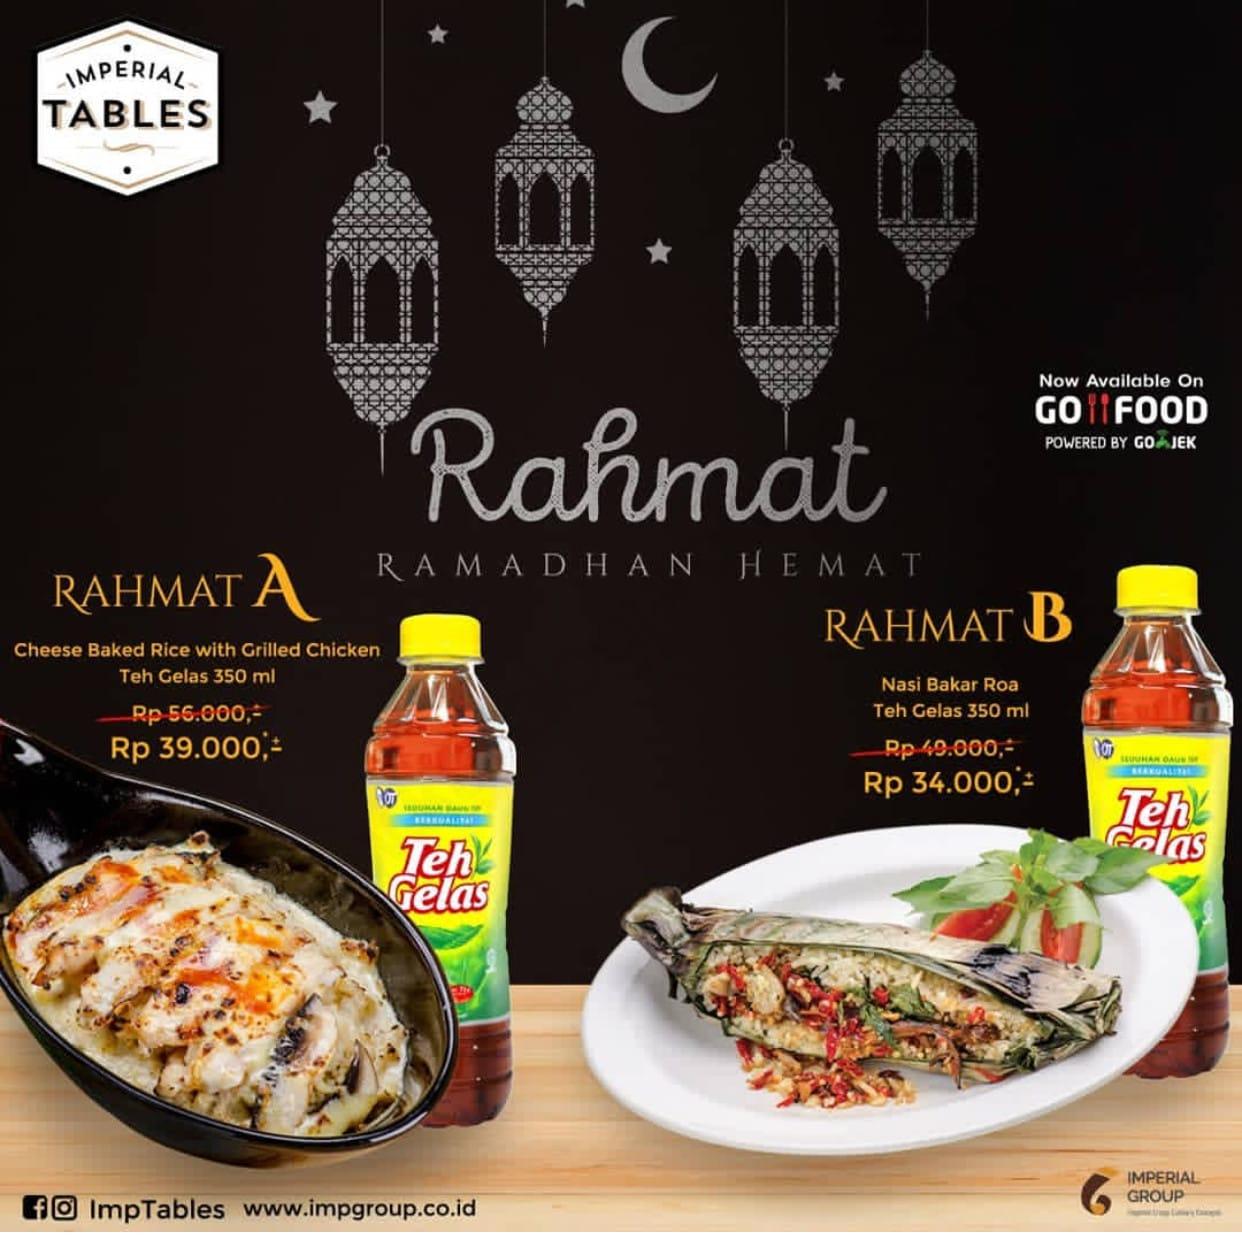 IMPERIAL TABLES Promo Paket RAHMAT (Ramadhan Hemat) – Harga mulai Rp. 34.000